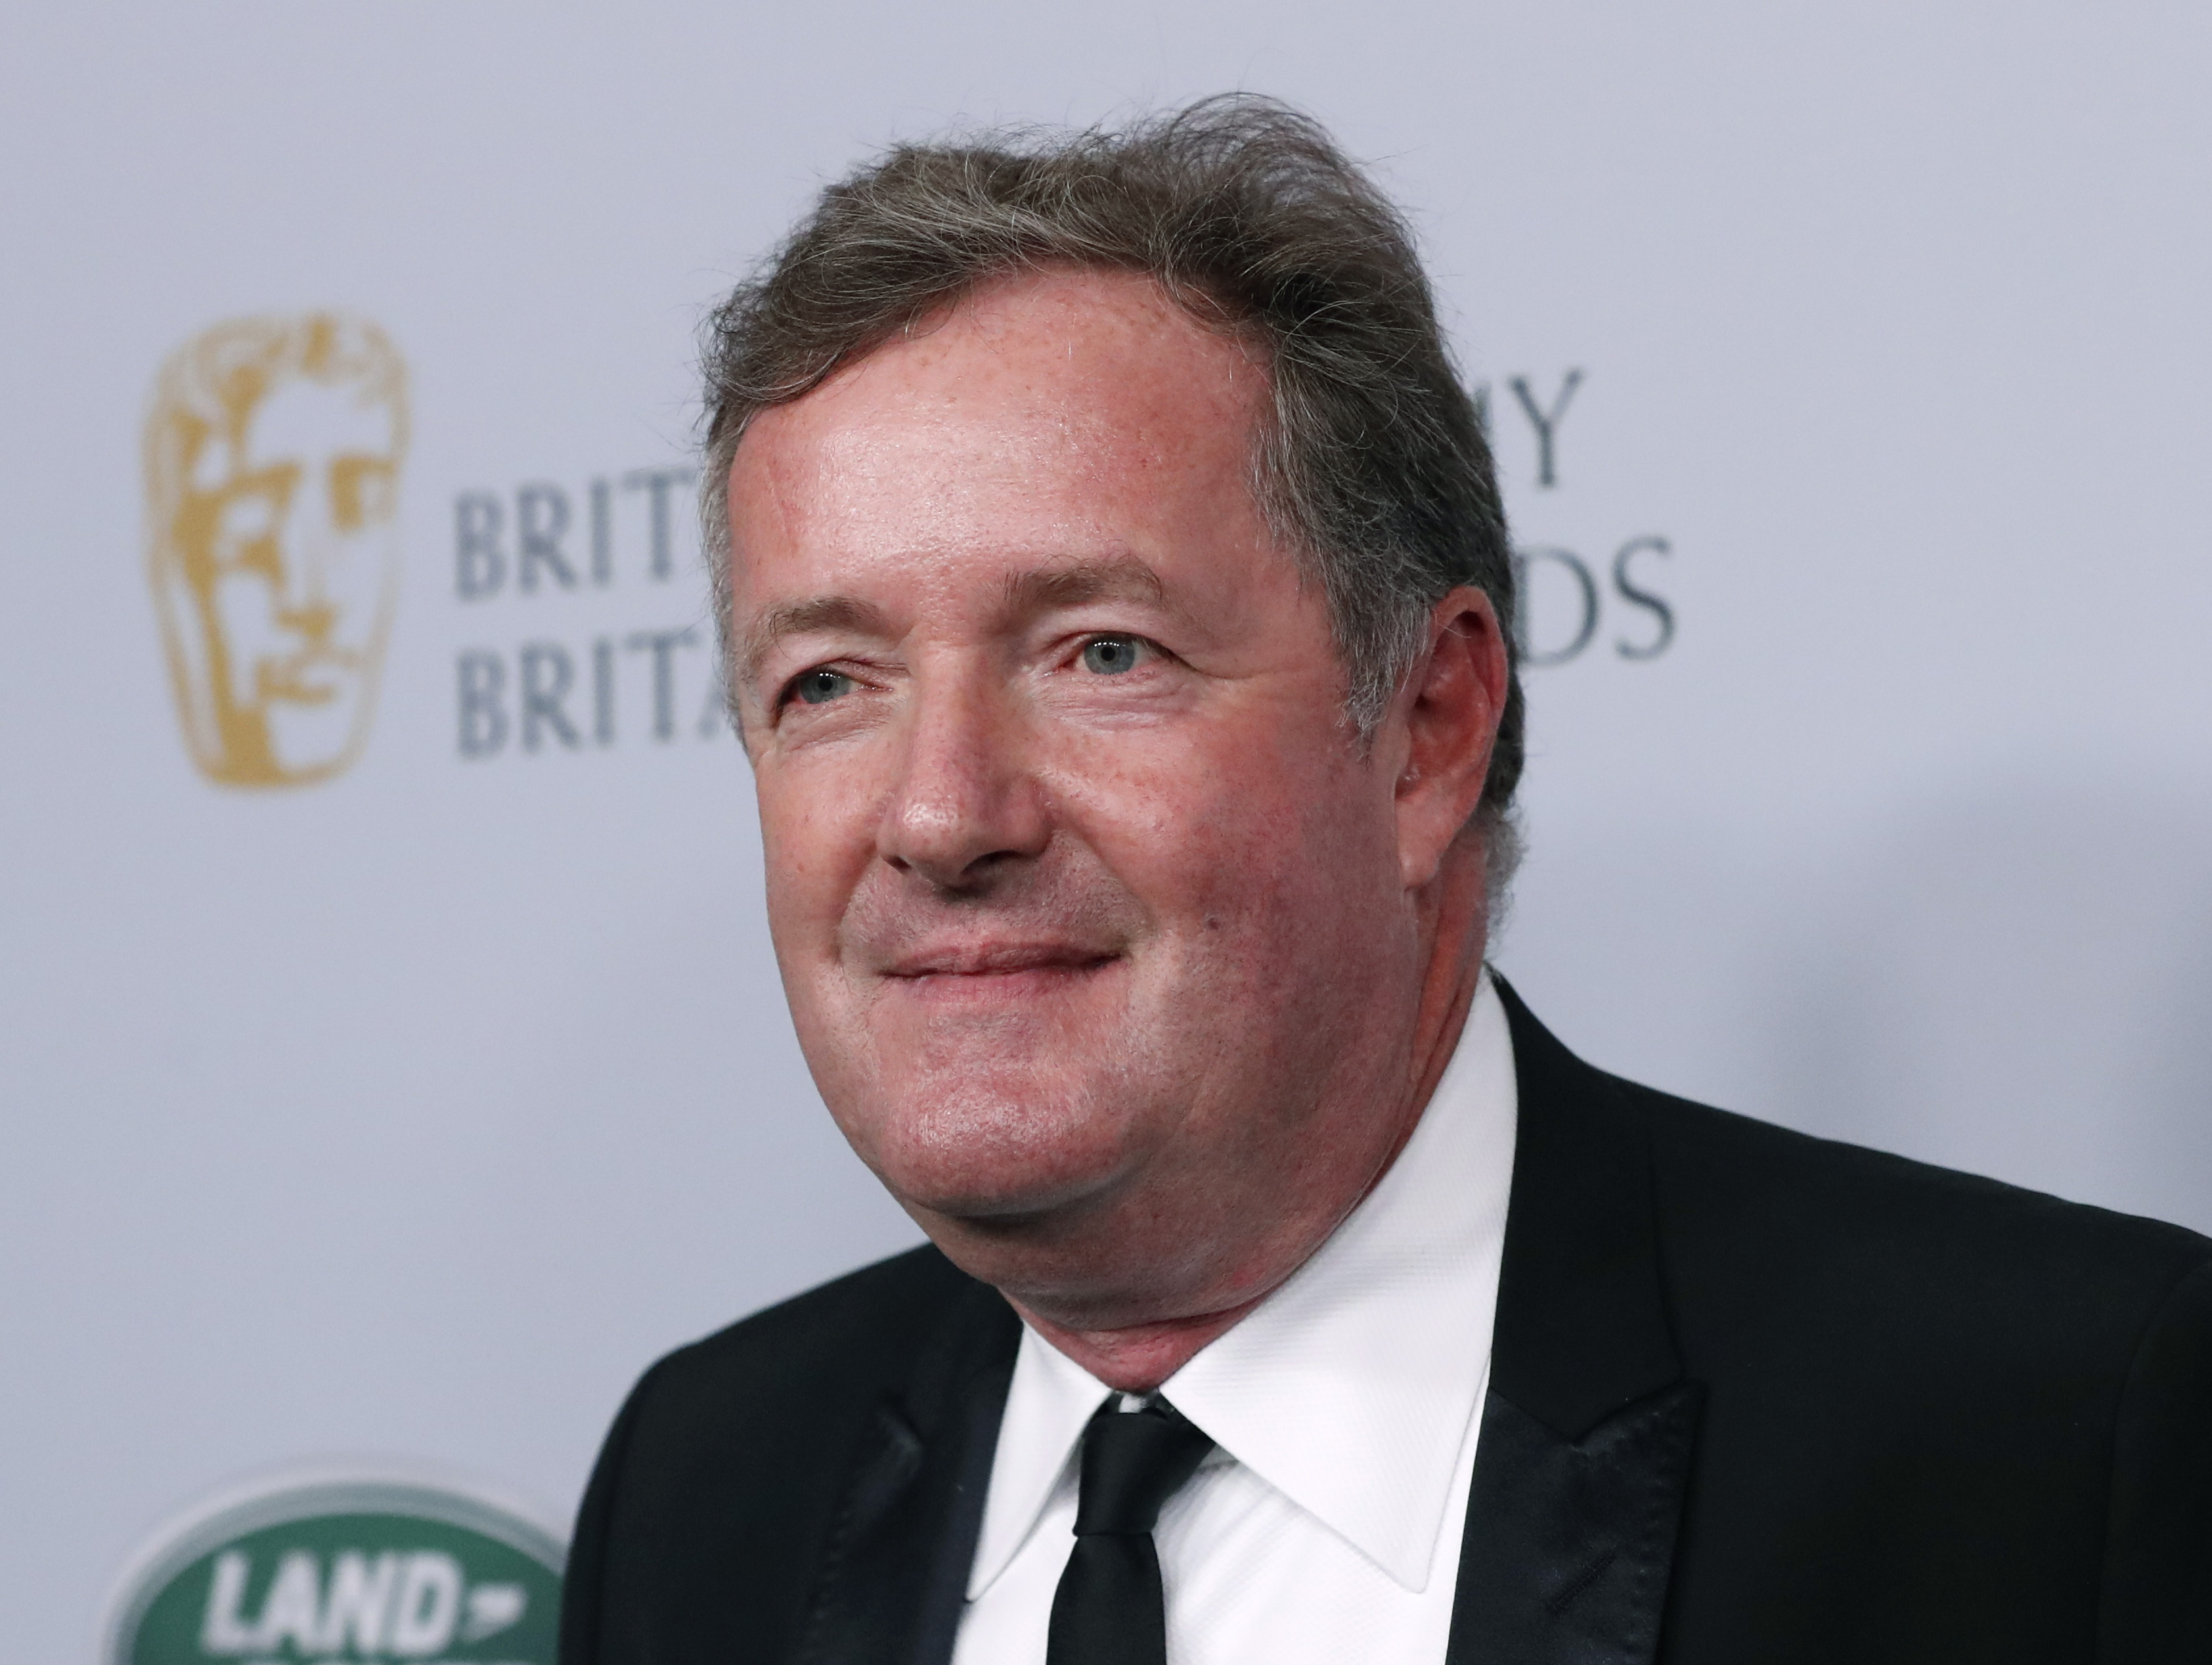 2019 British Academy Britannia Awards - Arrivals - Beverly Hills, California, U.S., October 25, 2019 - Piers Morgan. REUTERS/Mario Anzuoni